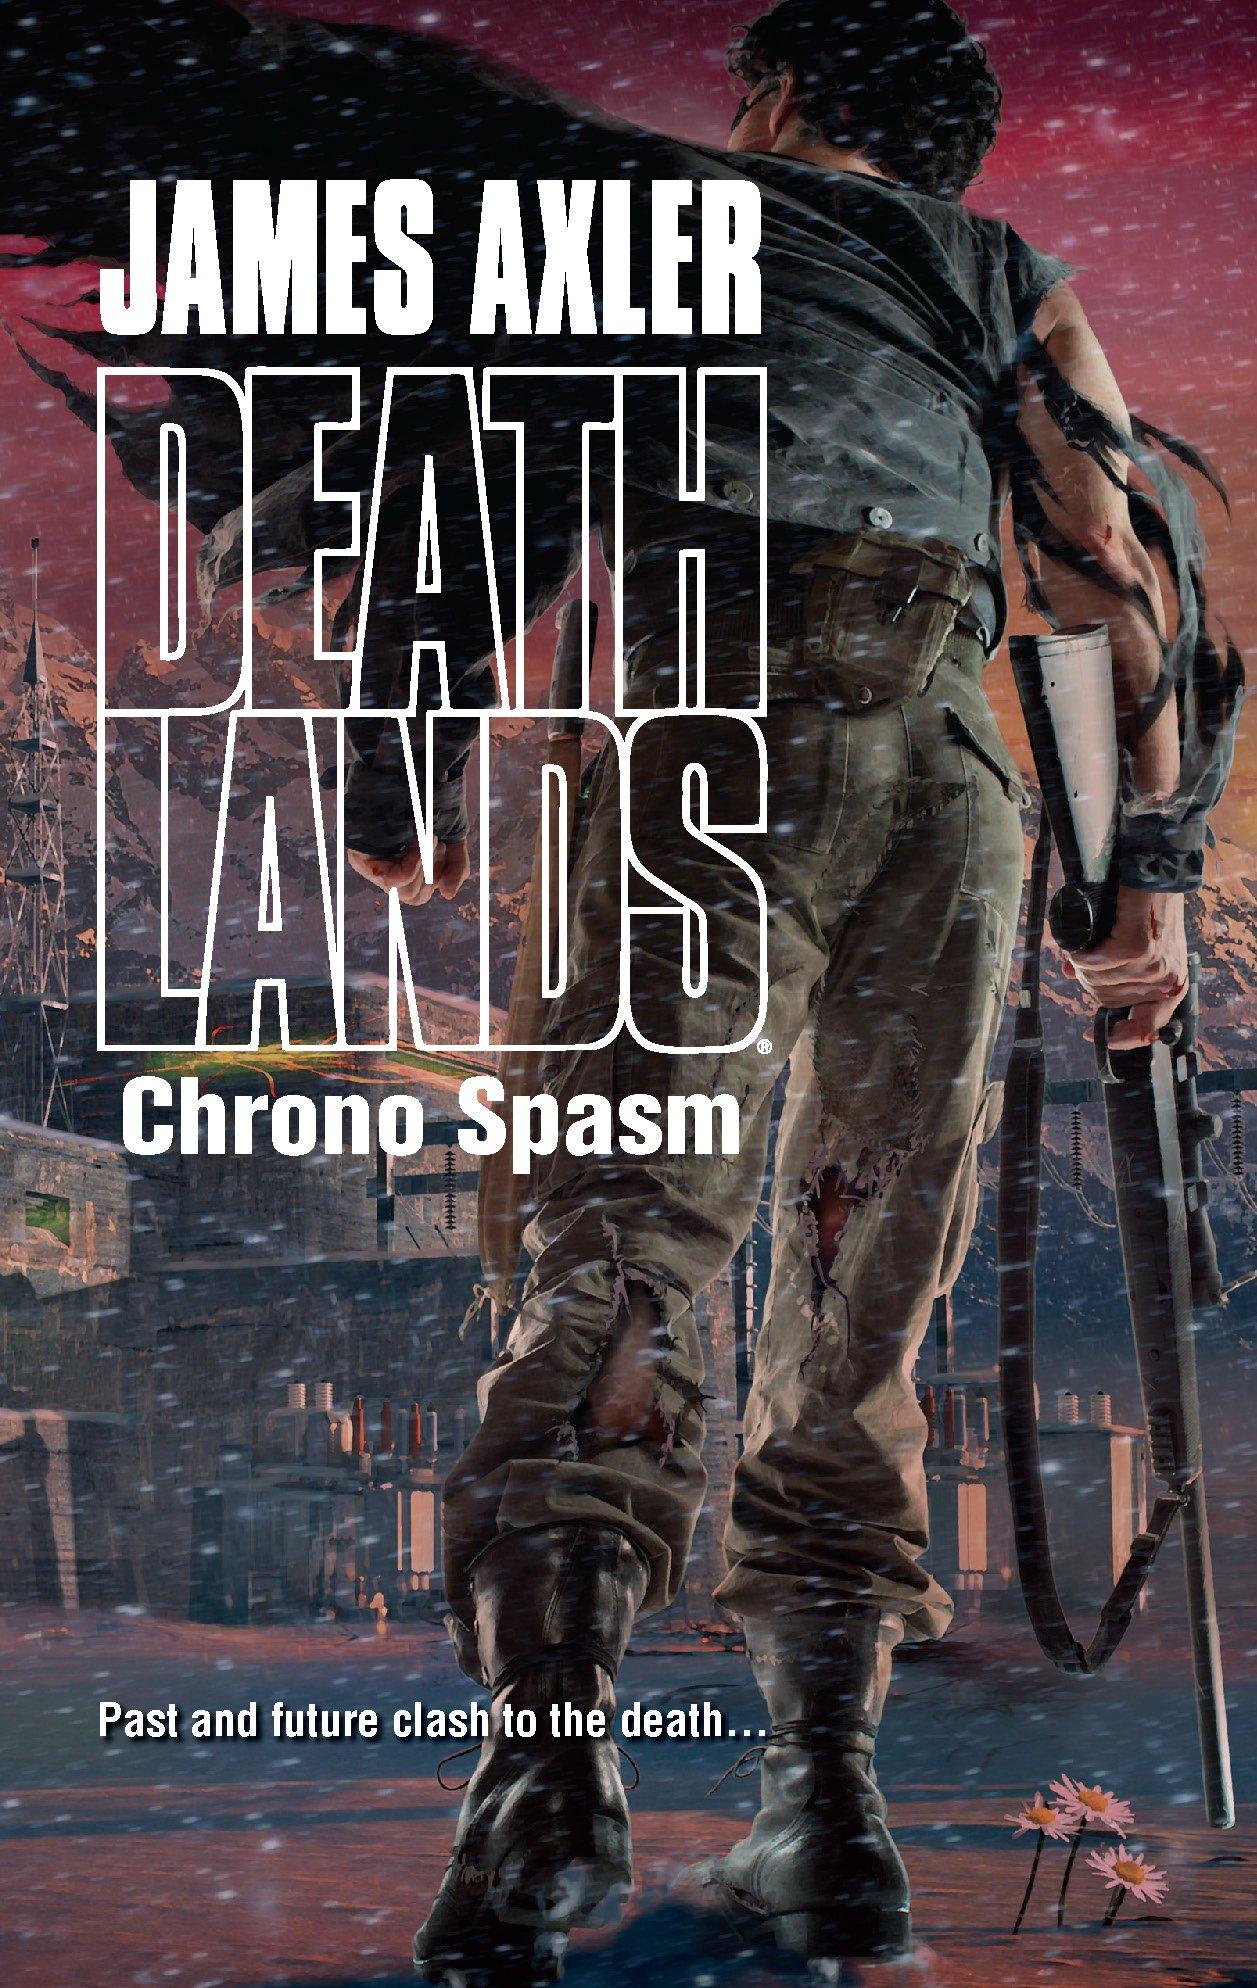 Read Online Chrono Spasm (Deathlands) pdf epub